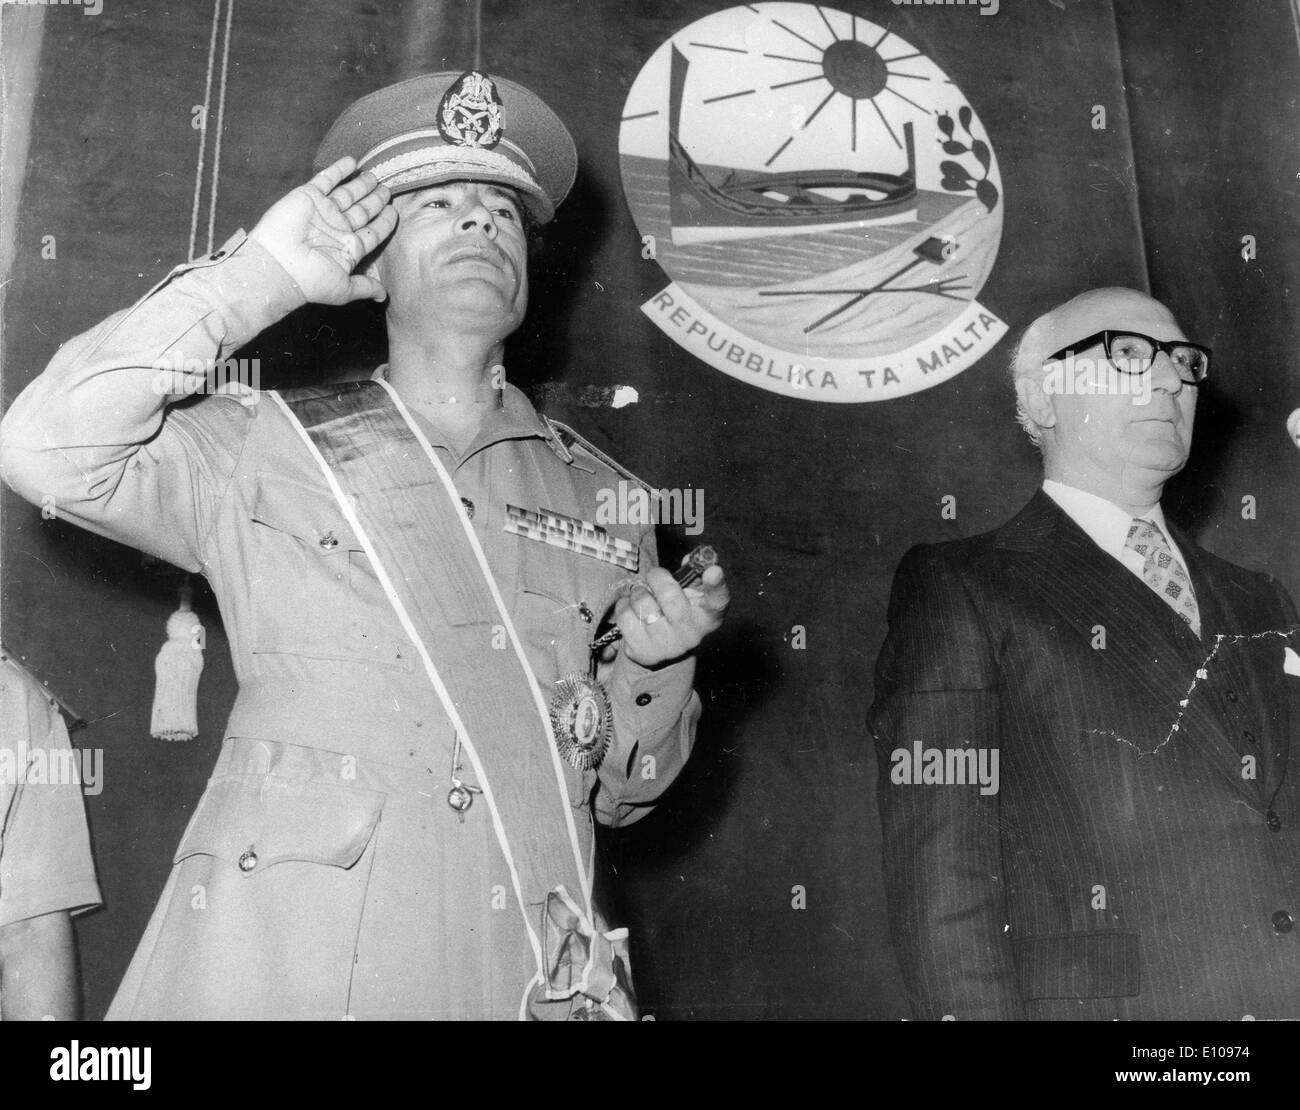 MUAMMAR AL-GADDAFI (born c. 1942) has been the de facto leader of Libya since 1969. - Stock Image